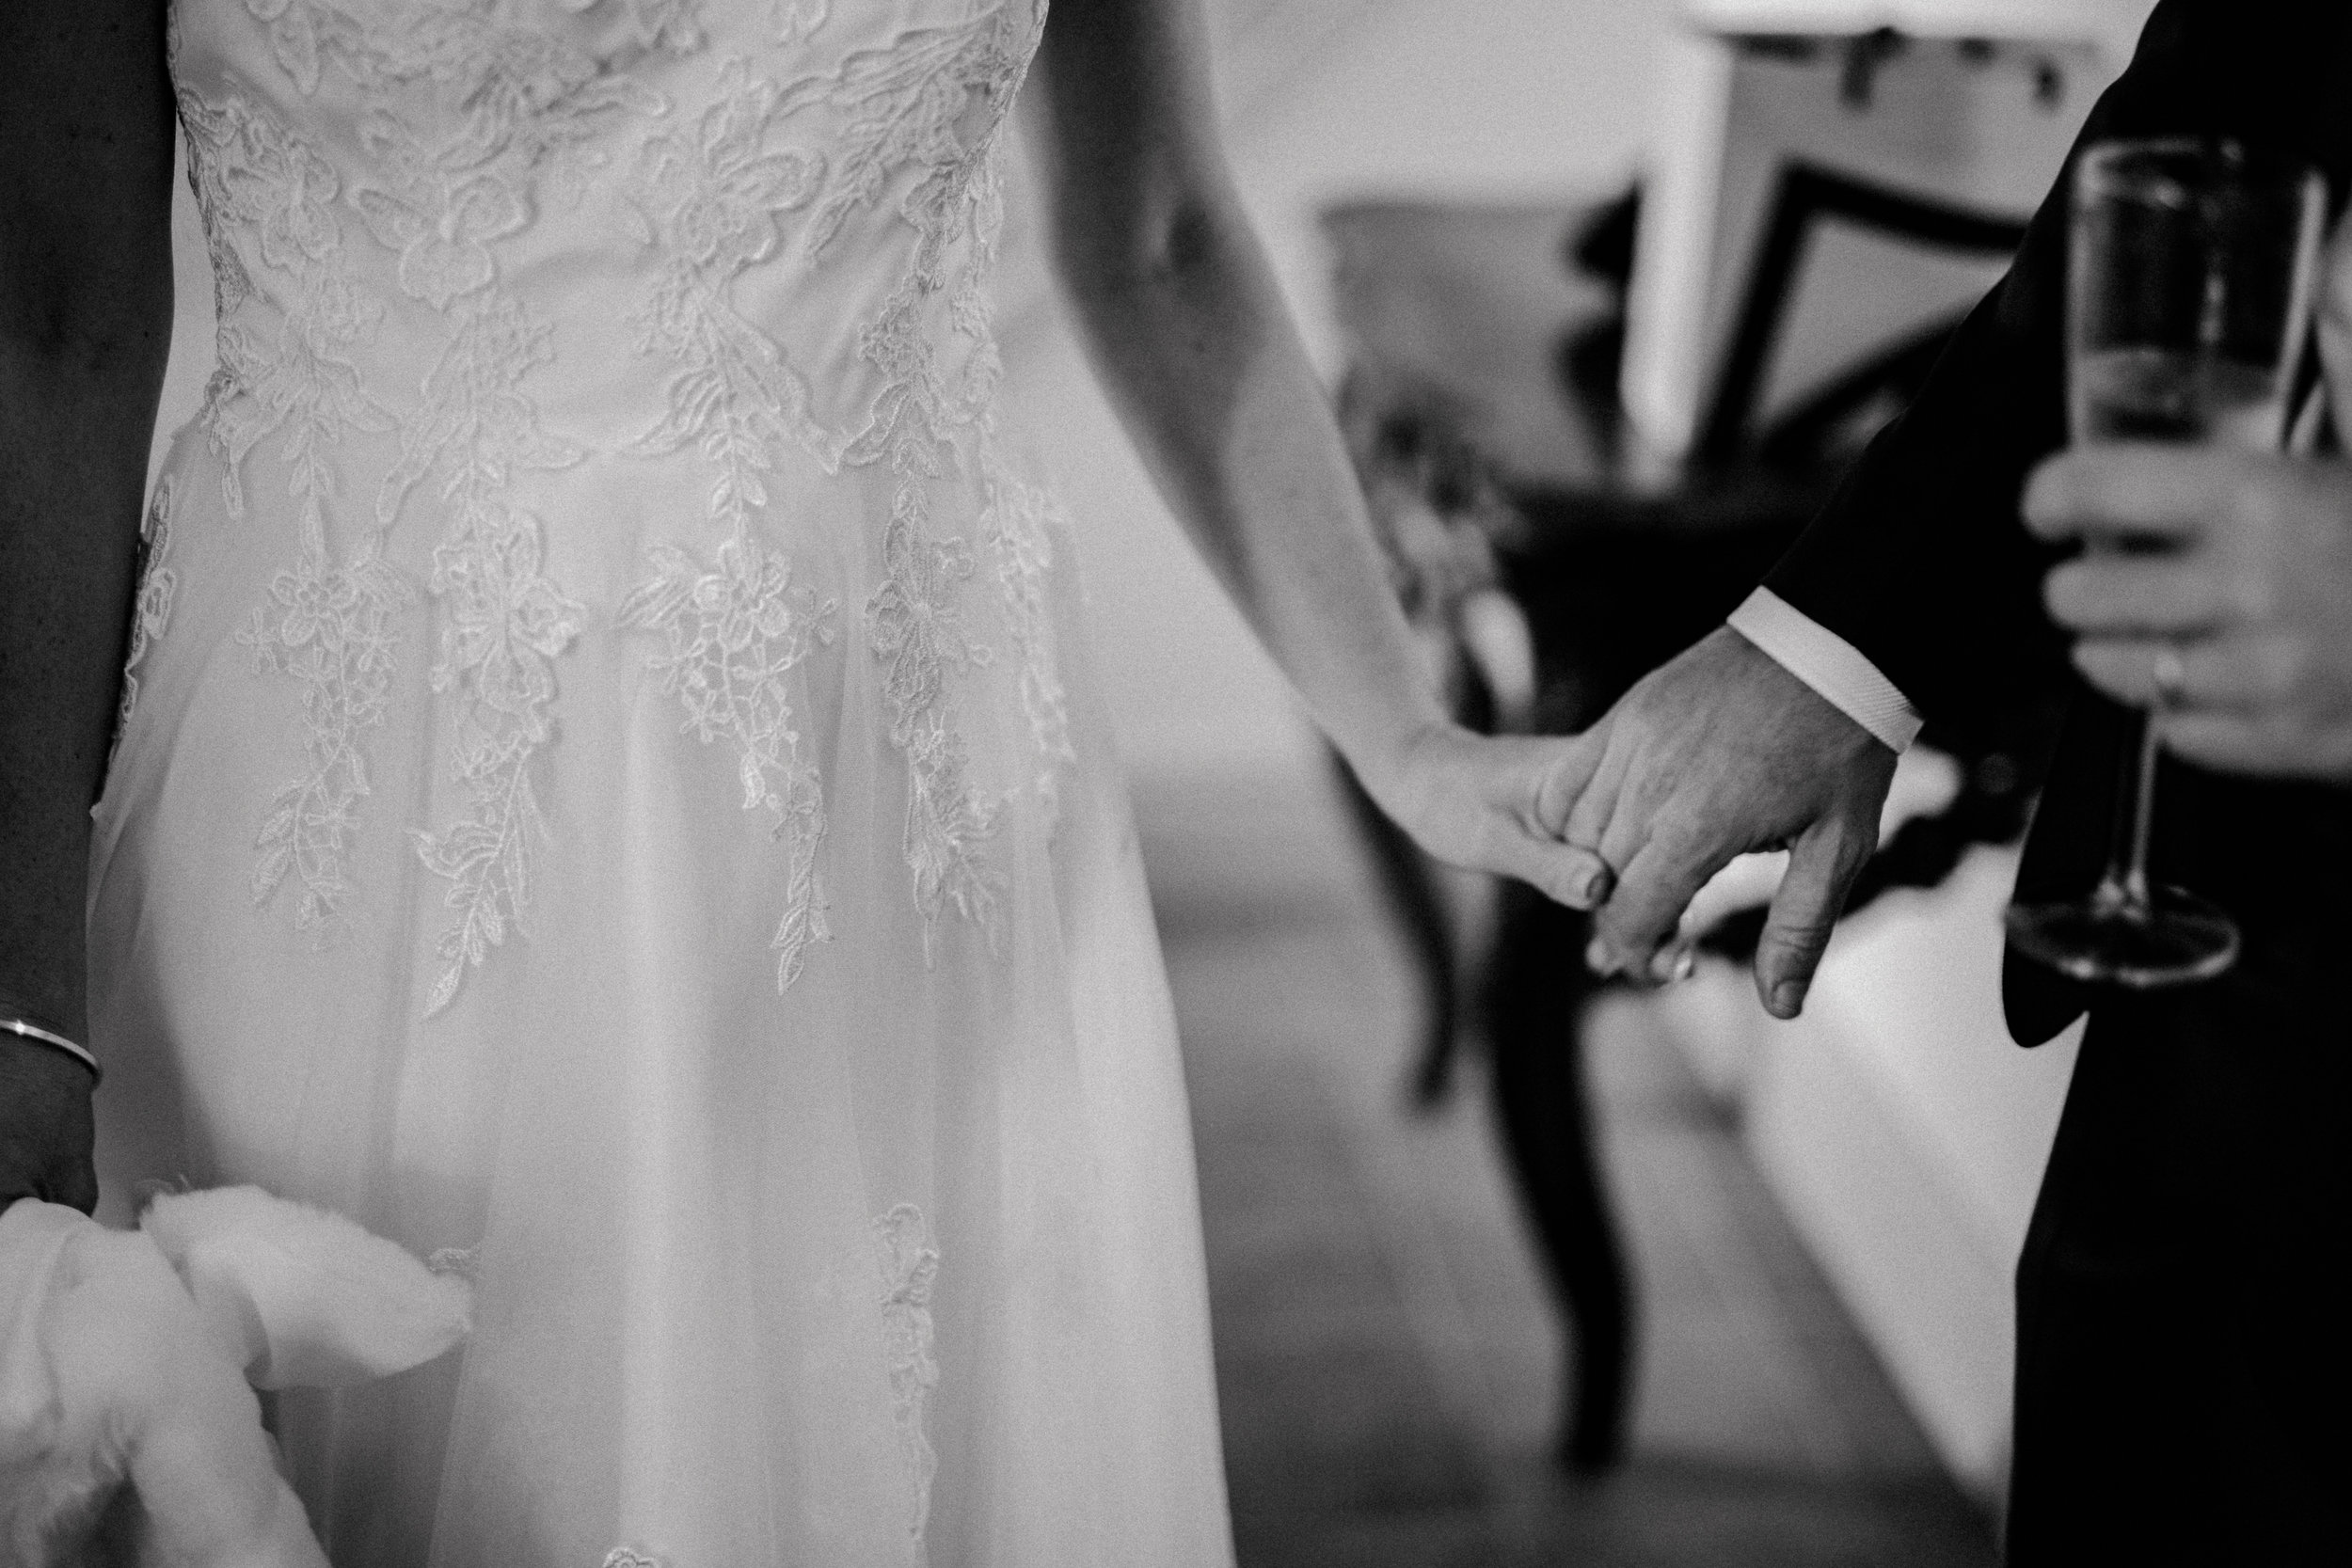 Bröllopsfotograf-Uddetorp Säteri-Höstbröllop-Fotograf Emilia- Bröllopsfotograf Borås-14.jpg